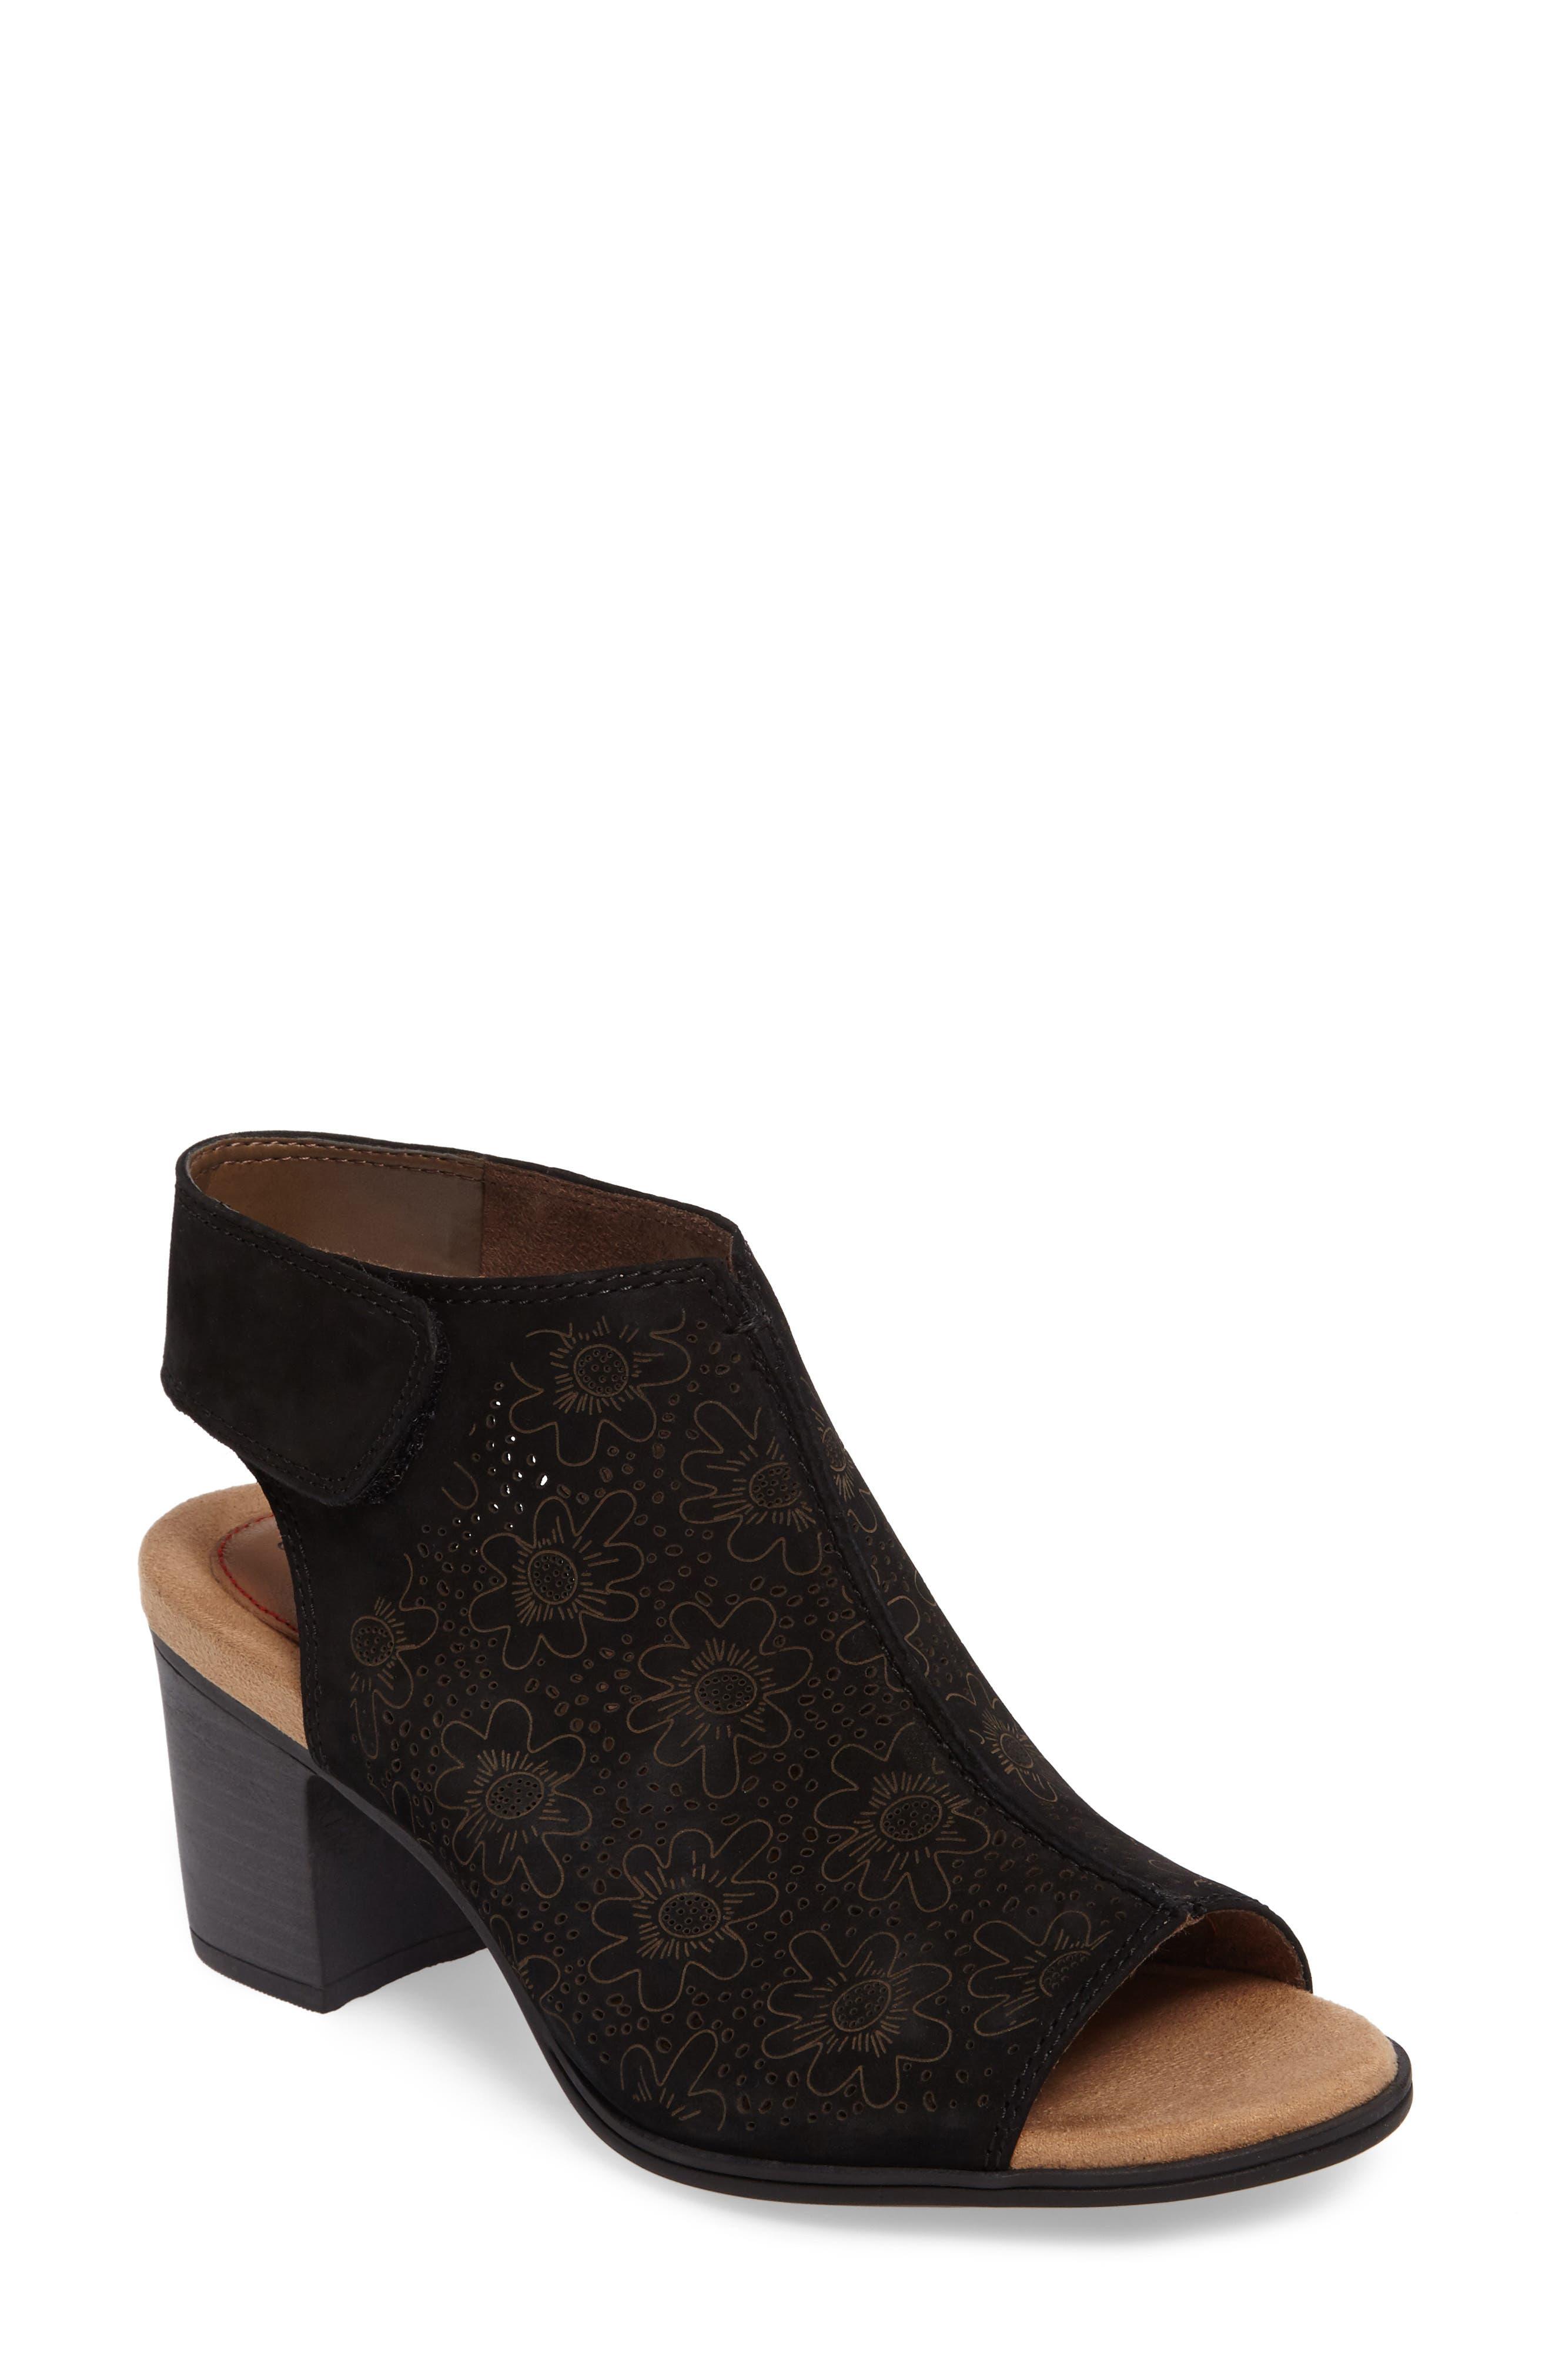 Rockport Cobb Hill Hattie Perforated Slingback Sandal (Women)